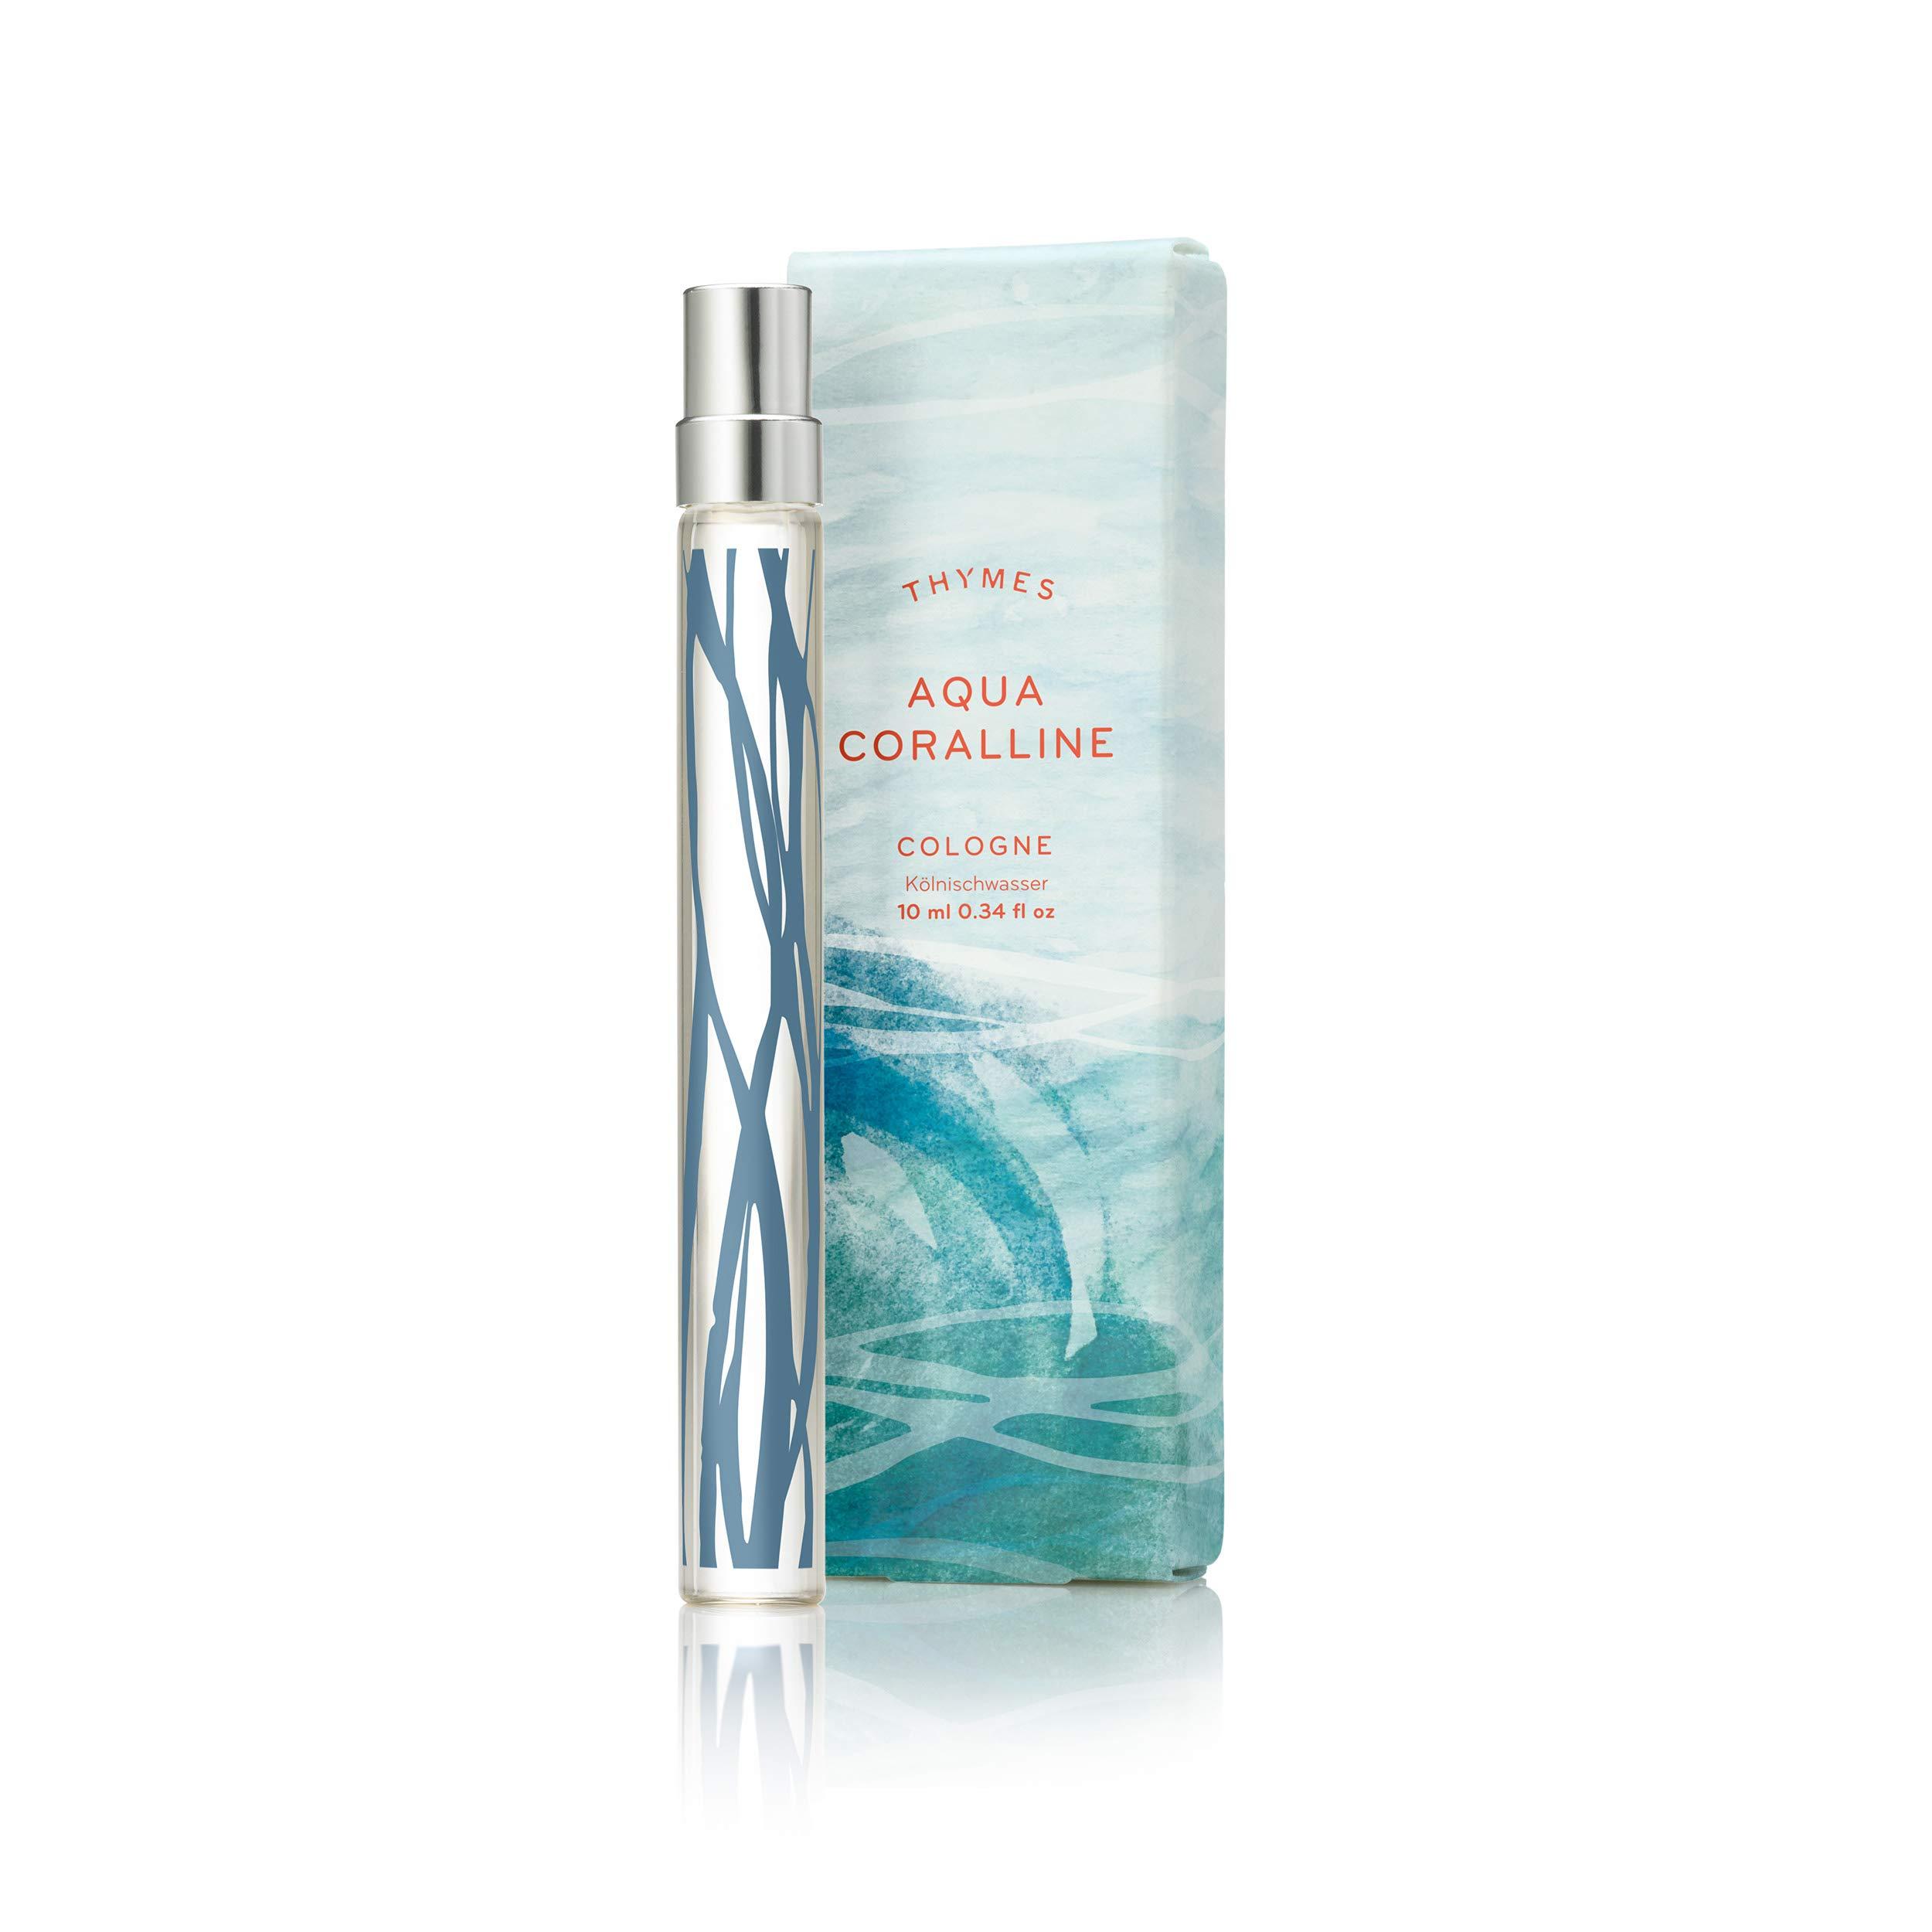 Thymes - Aqua Coralline Cologne Spray Pen